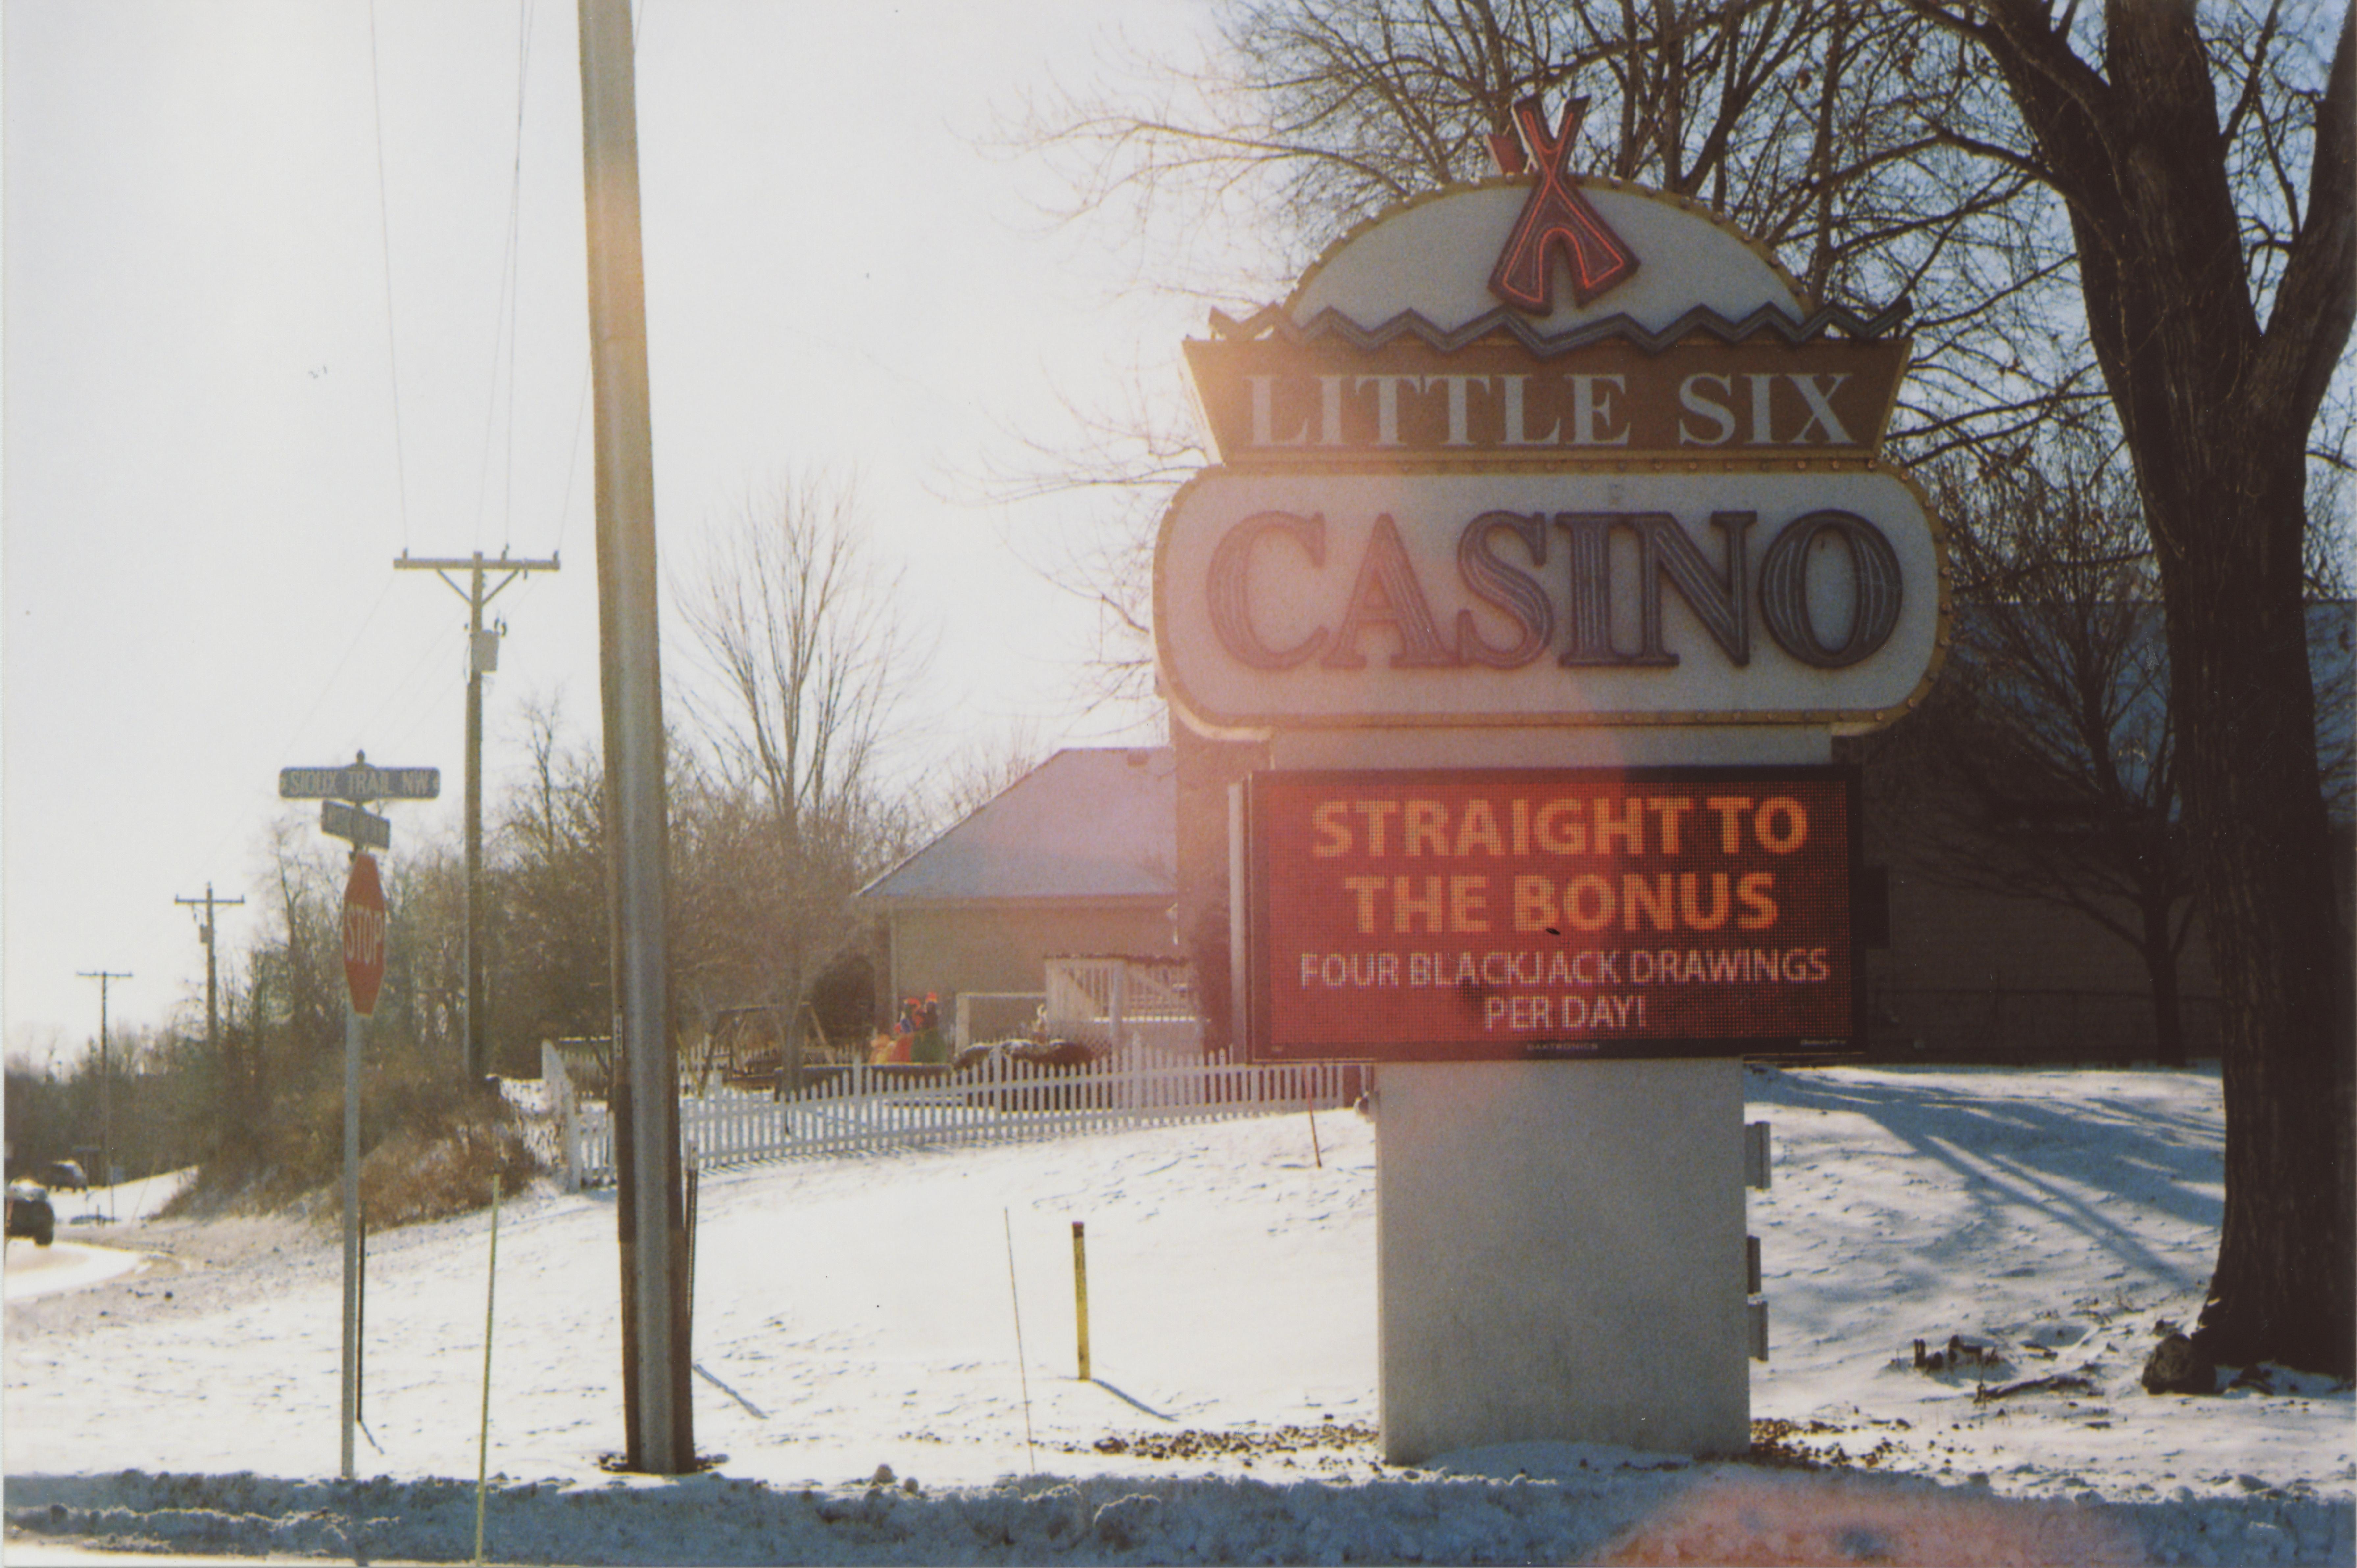 State run casinos in minnesota compendium games dota 2